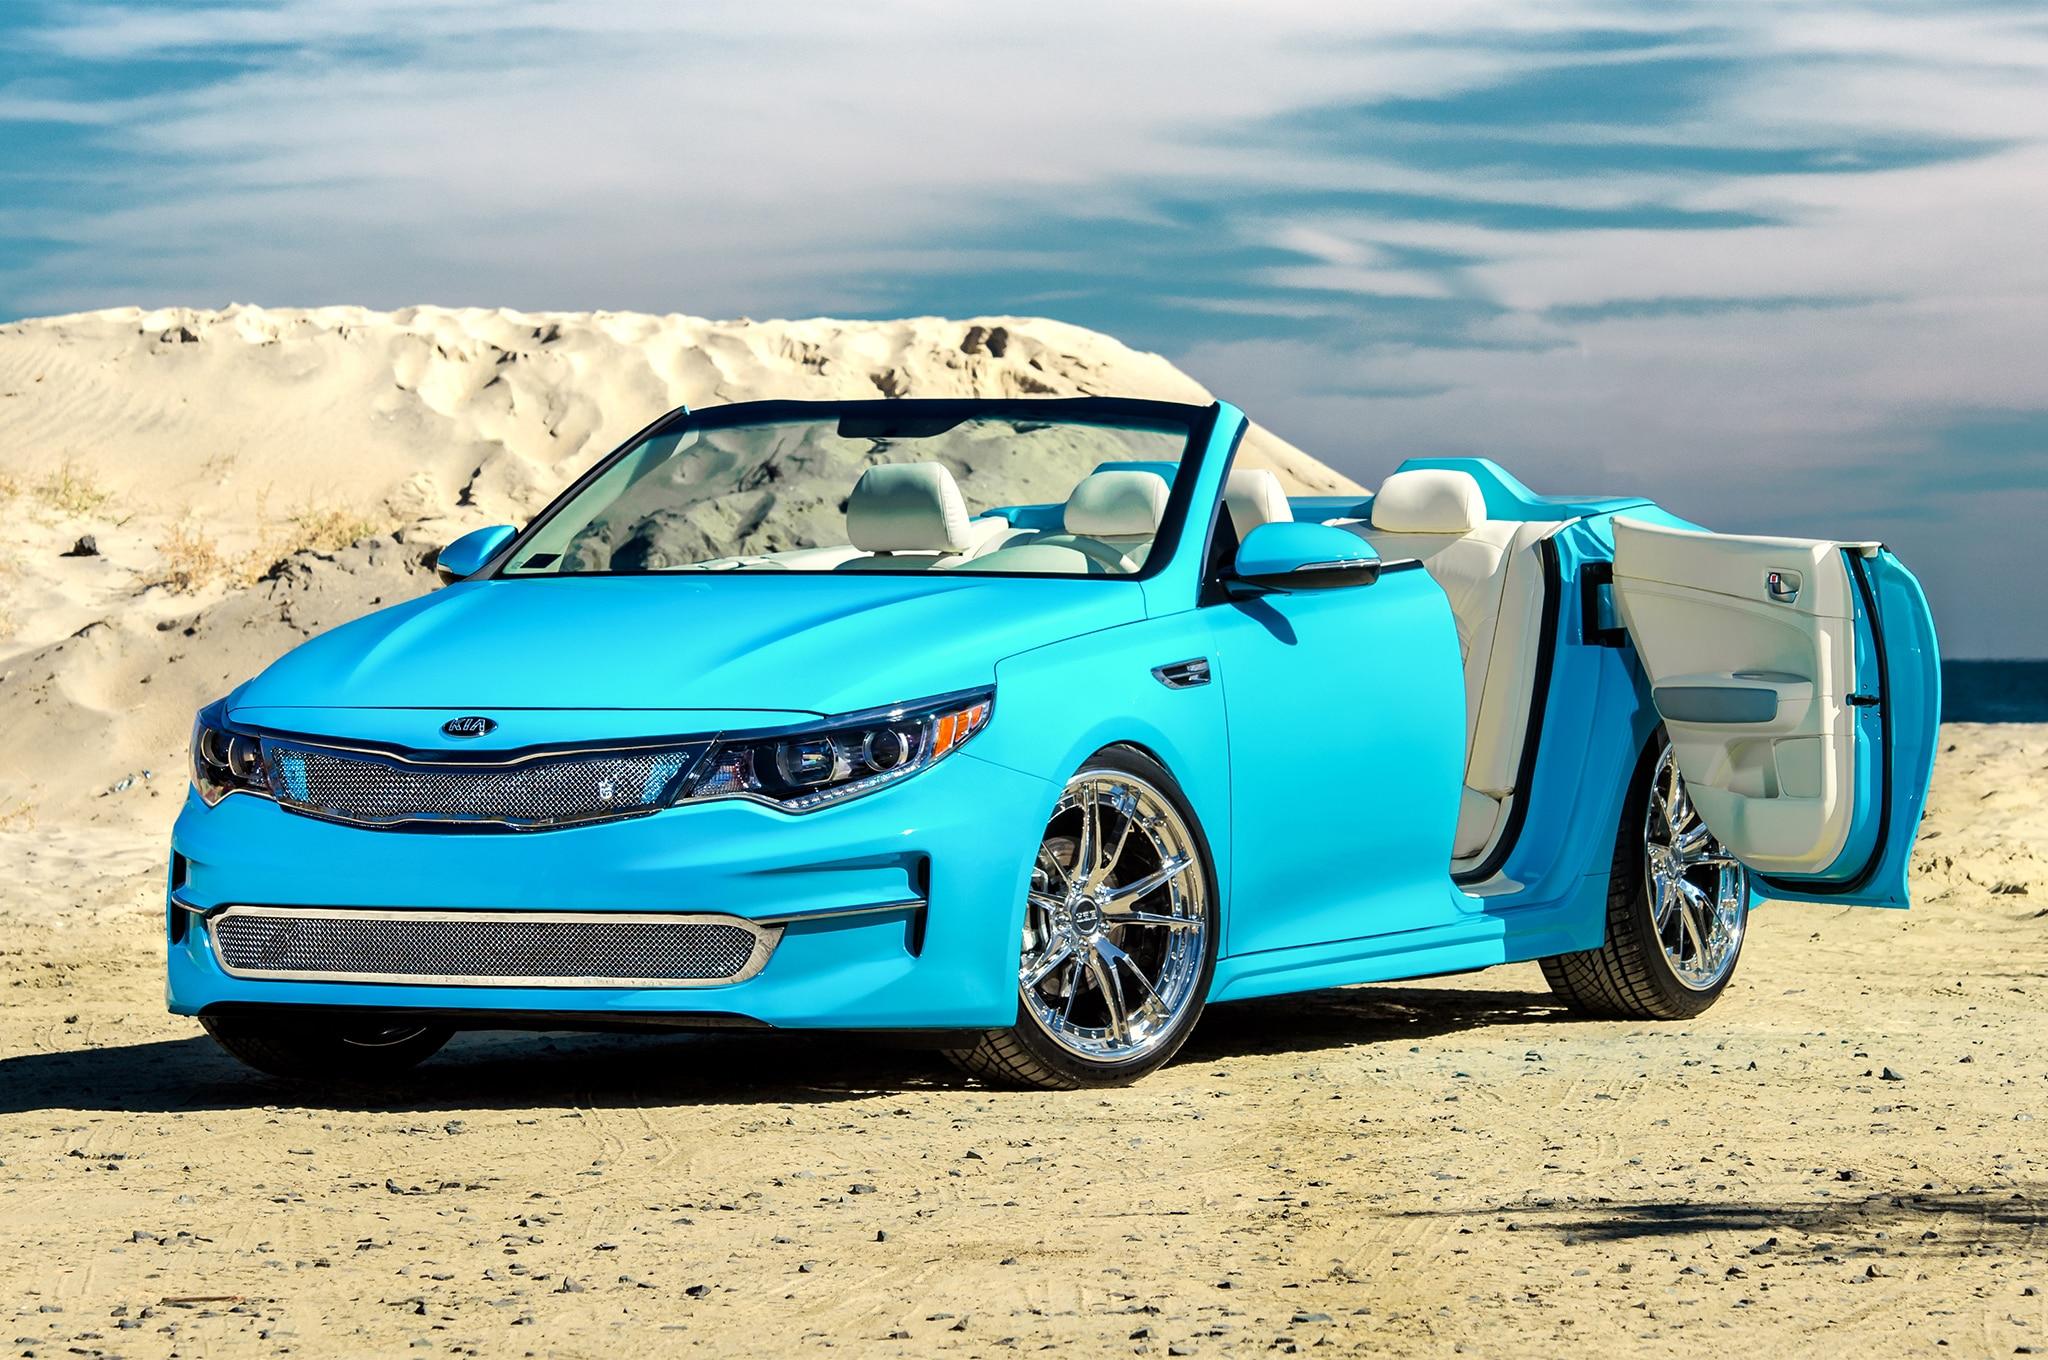 Kia Optima 2013 >> Convertible 2016 Kia Optima Concept Heads to SEMA